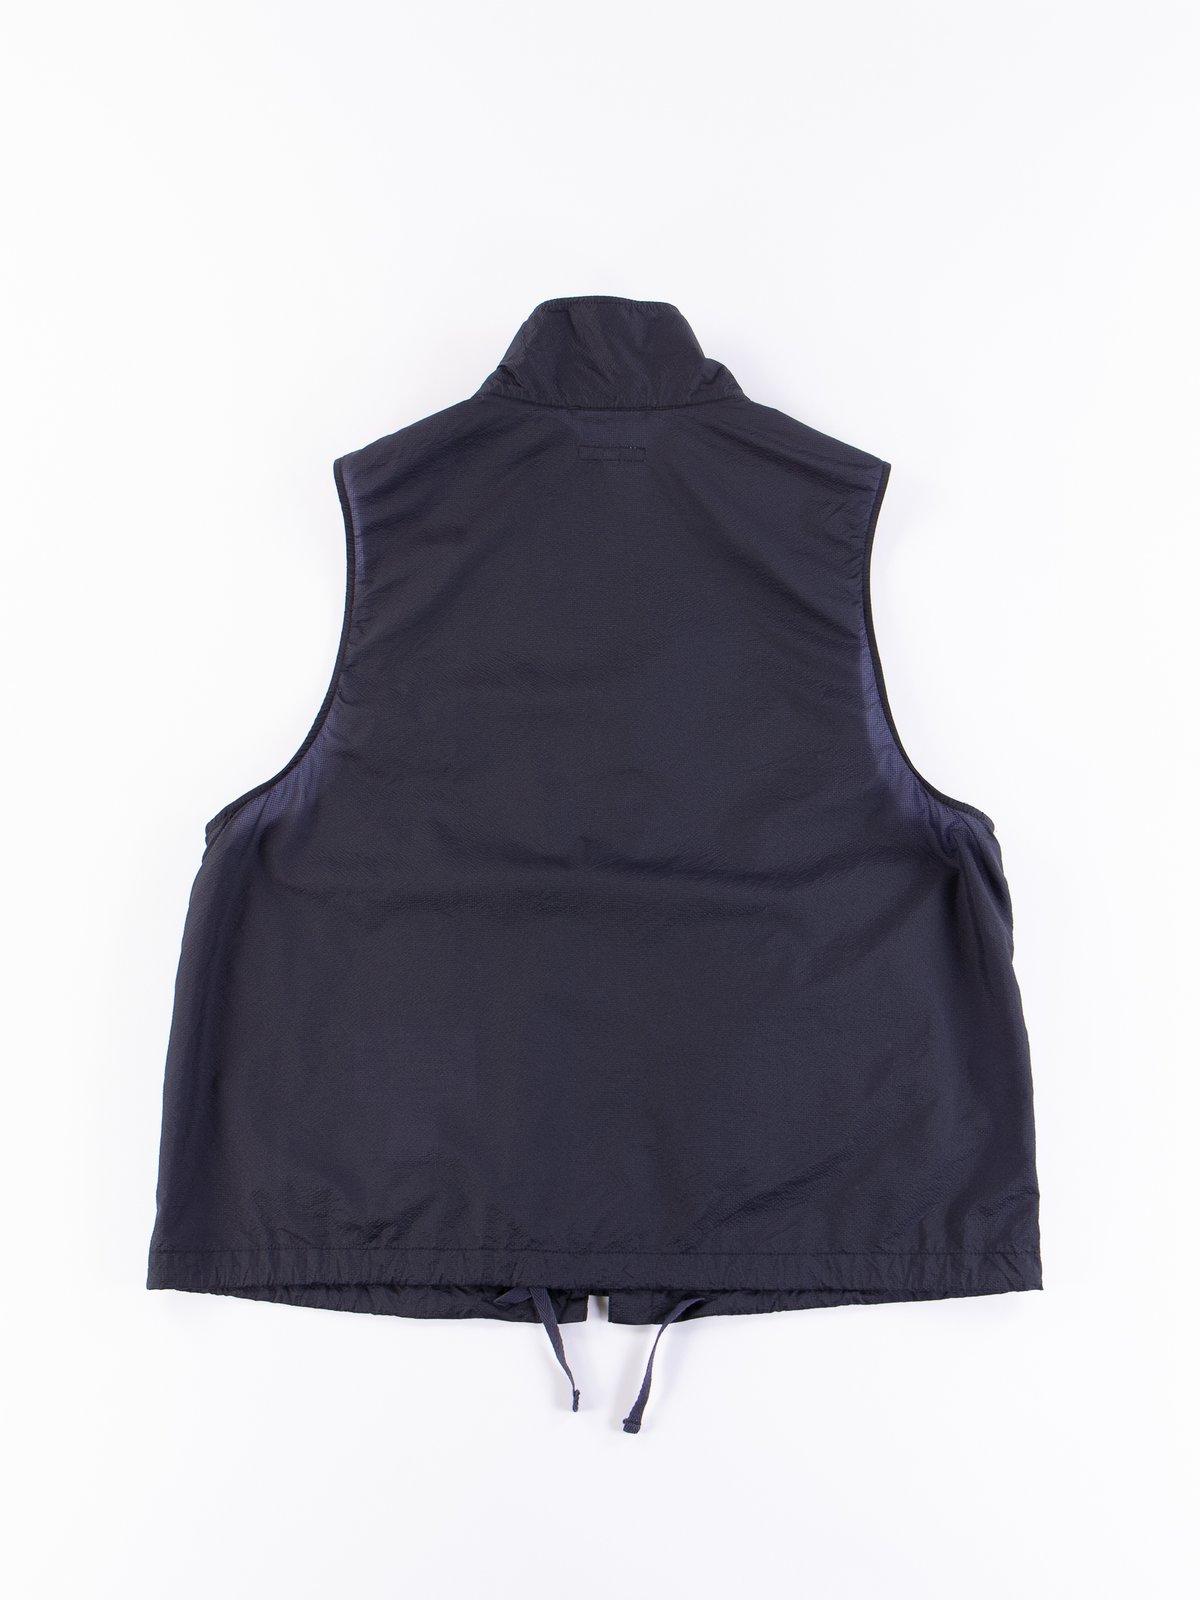 Dark Navy Nylon Micro Ripstop Field Vest - Image 5